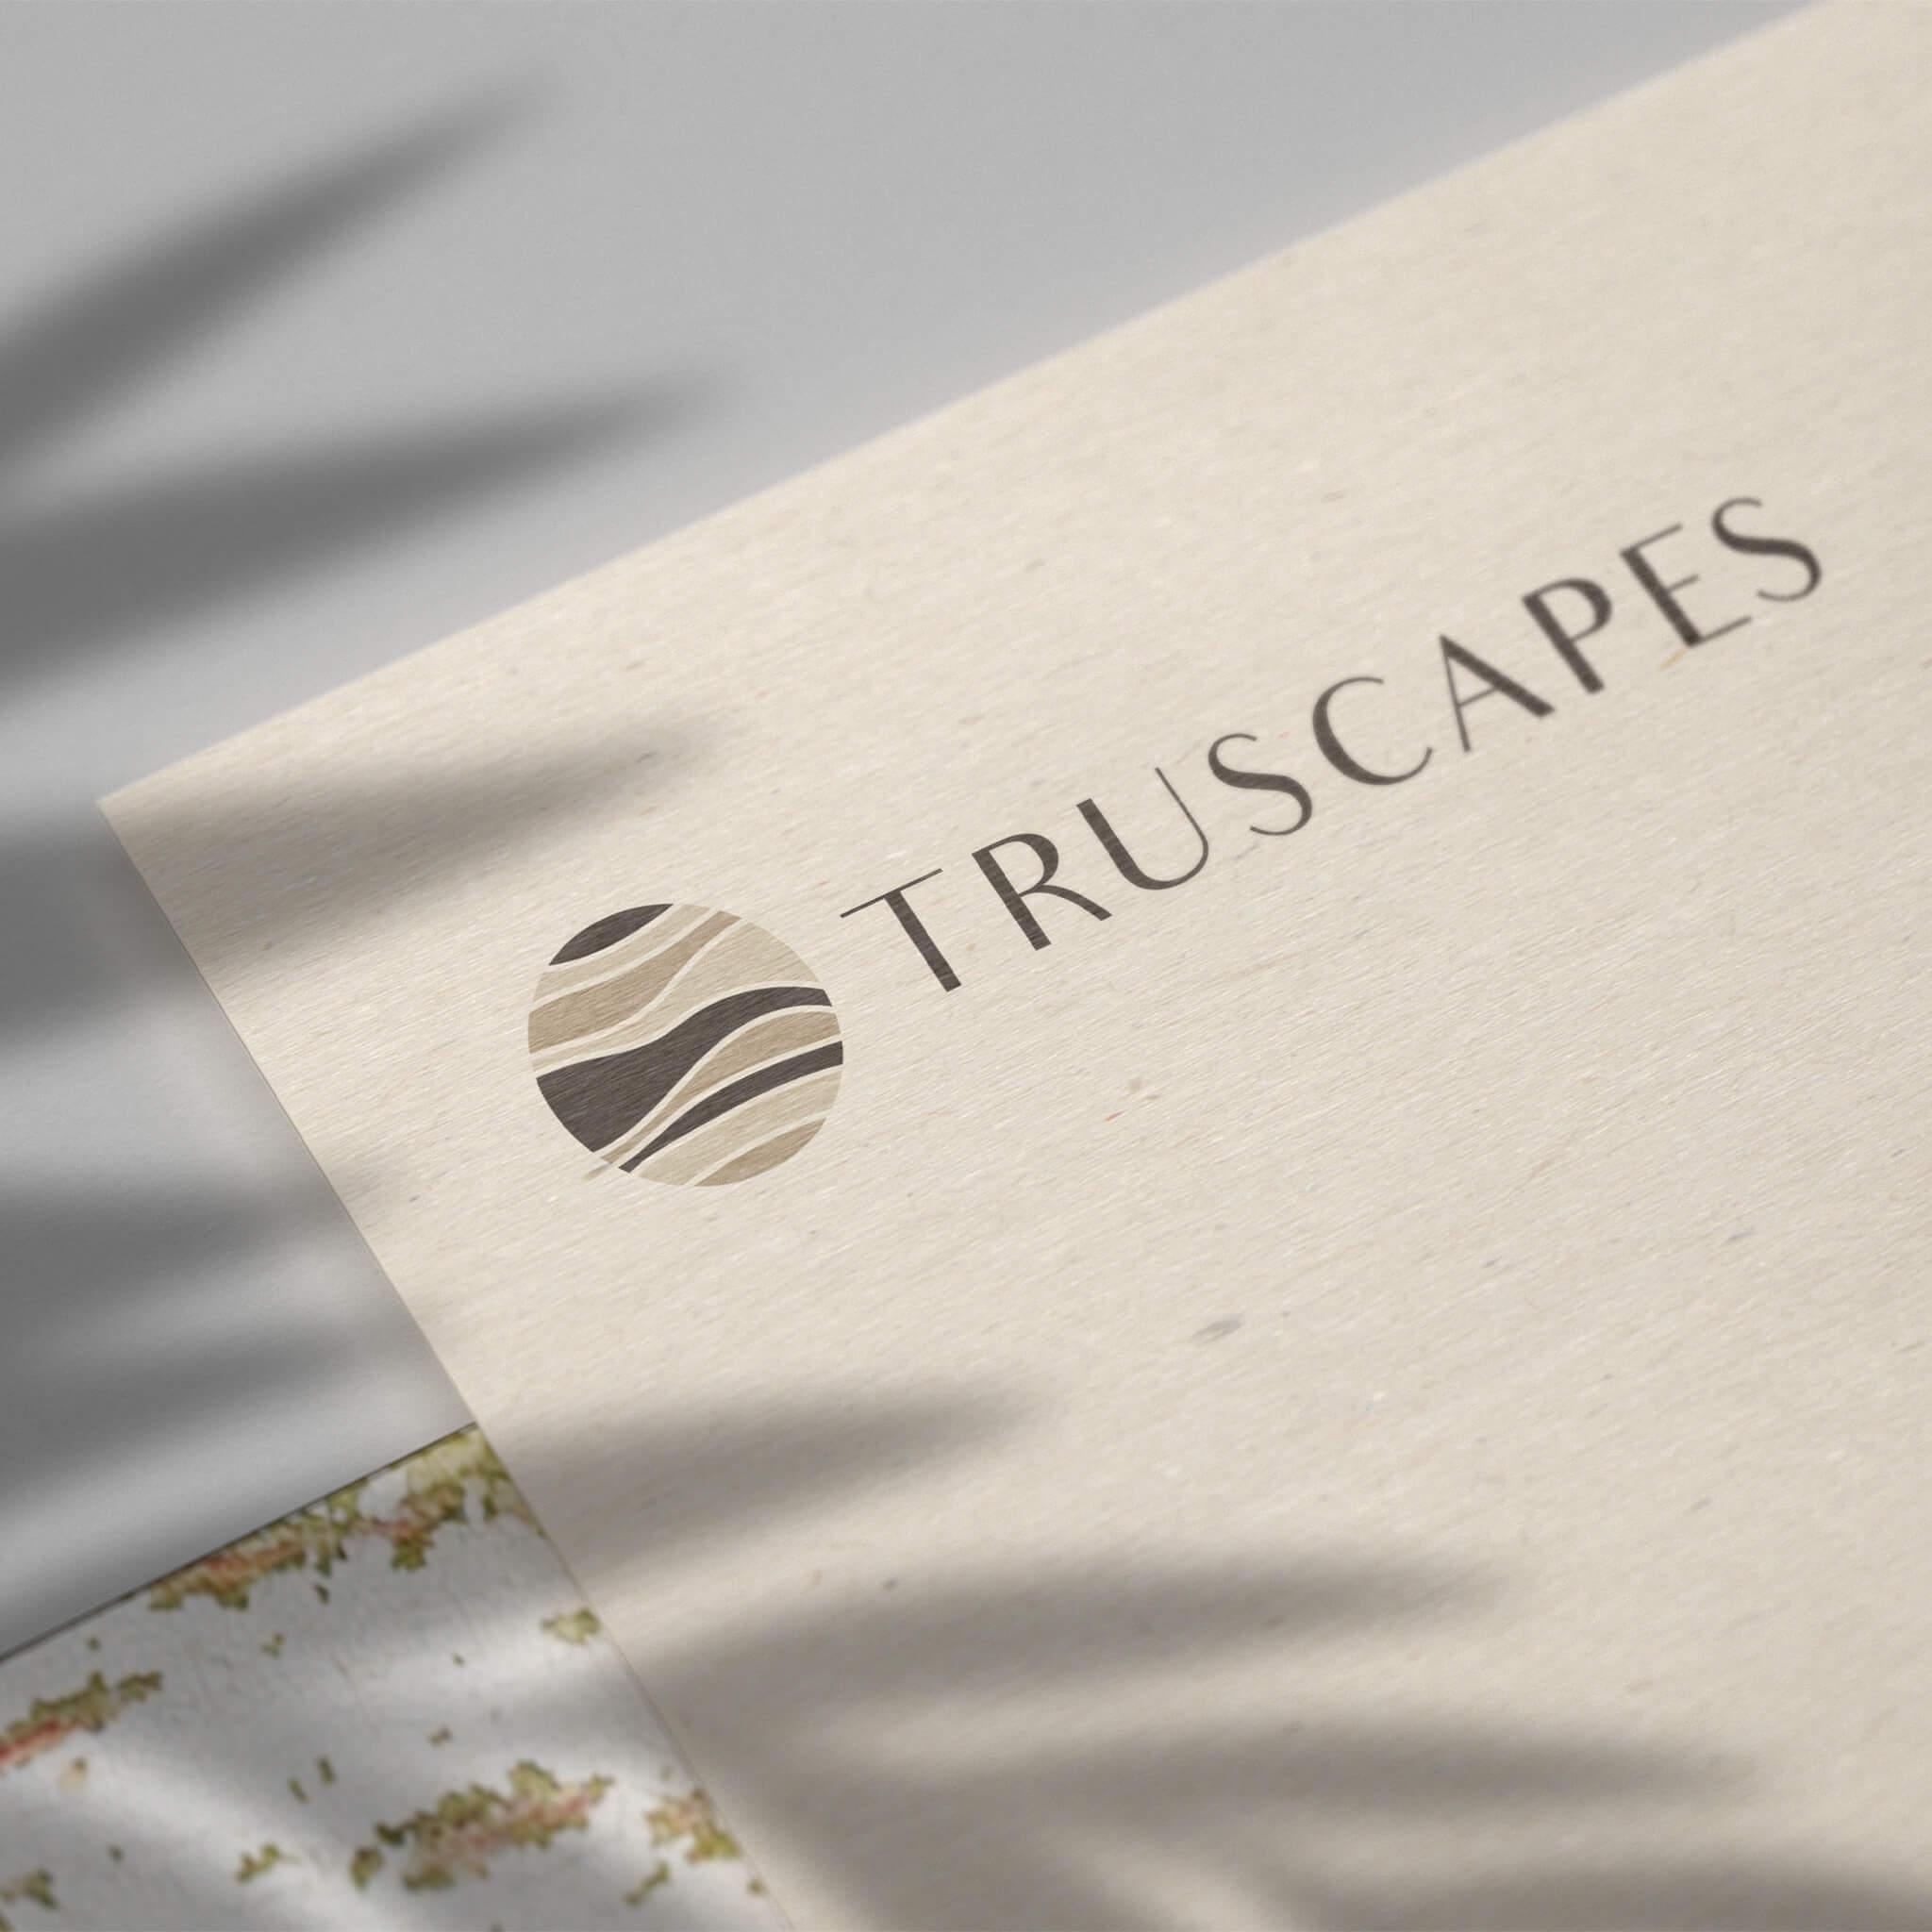 https://zanandcocreative.com.au/wp-content/uploads/2021/04/Truscapes-Logo-Design-Branding-Design.jpg